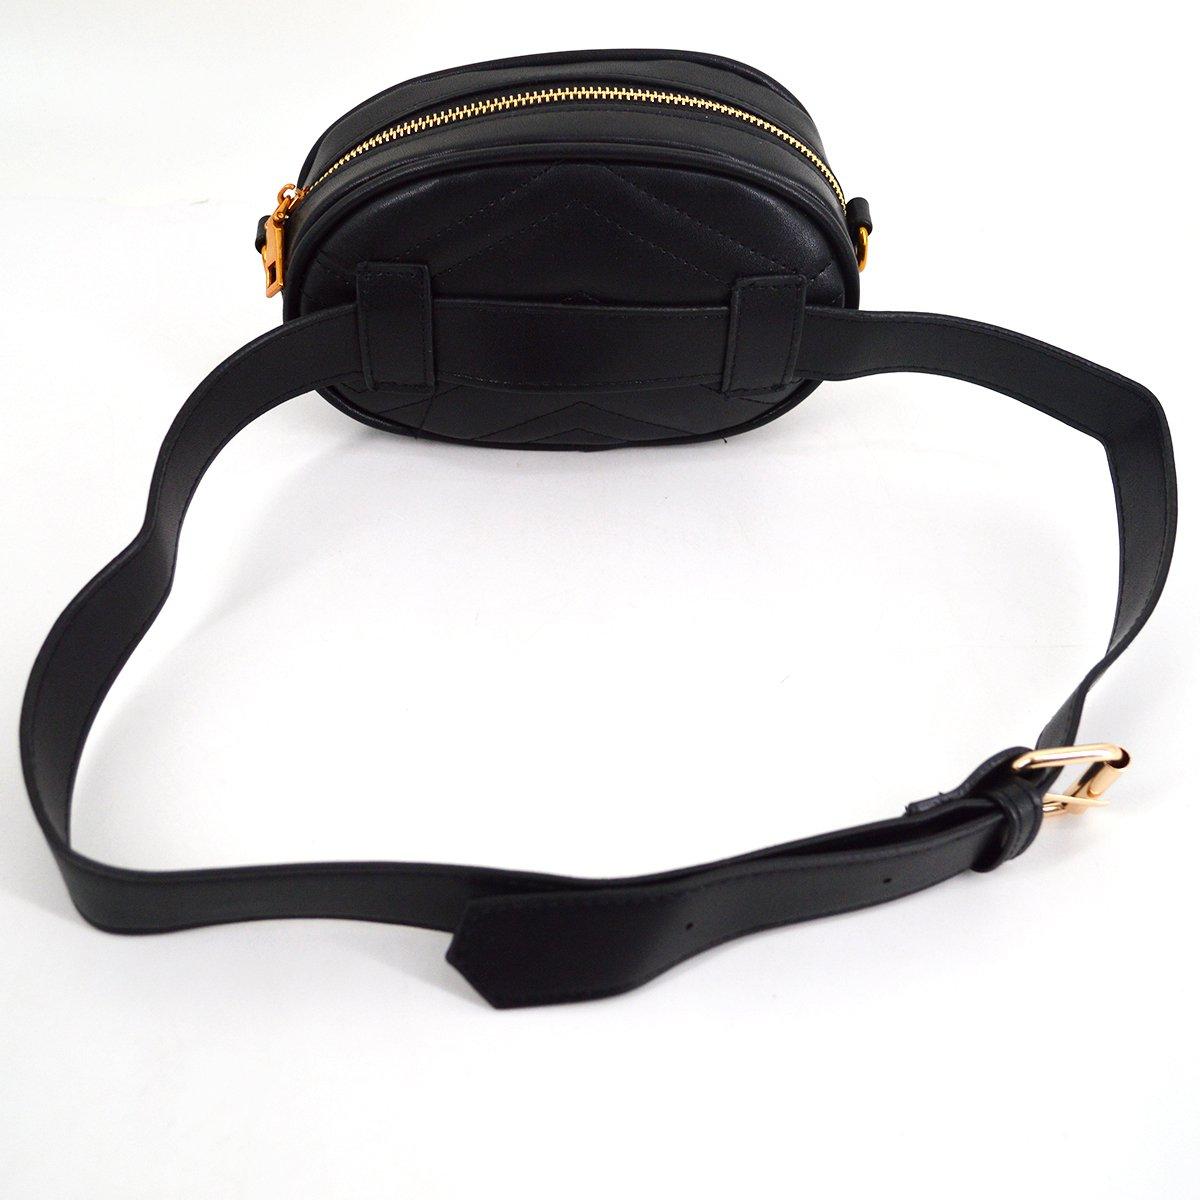 Mily Fashion Women Elegant PU Leather Waist Bag Love Shape Pattern Embroidery Cross Body Bag Fanny Packs by Mily (Image #5)